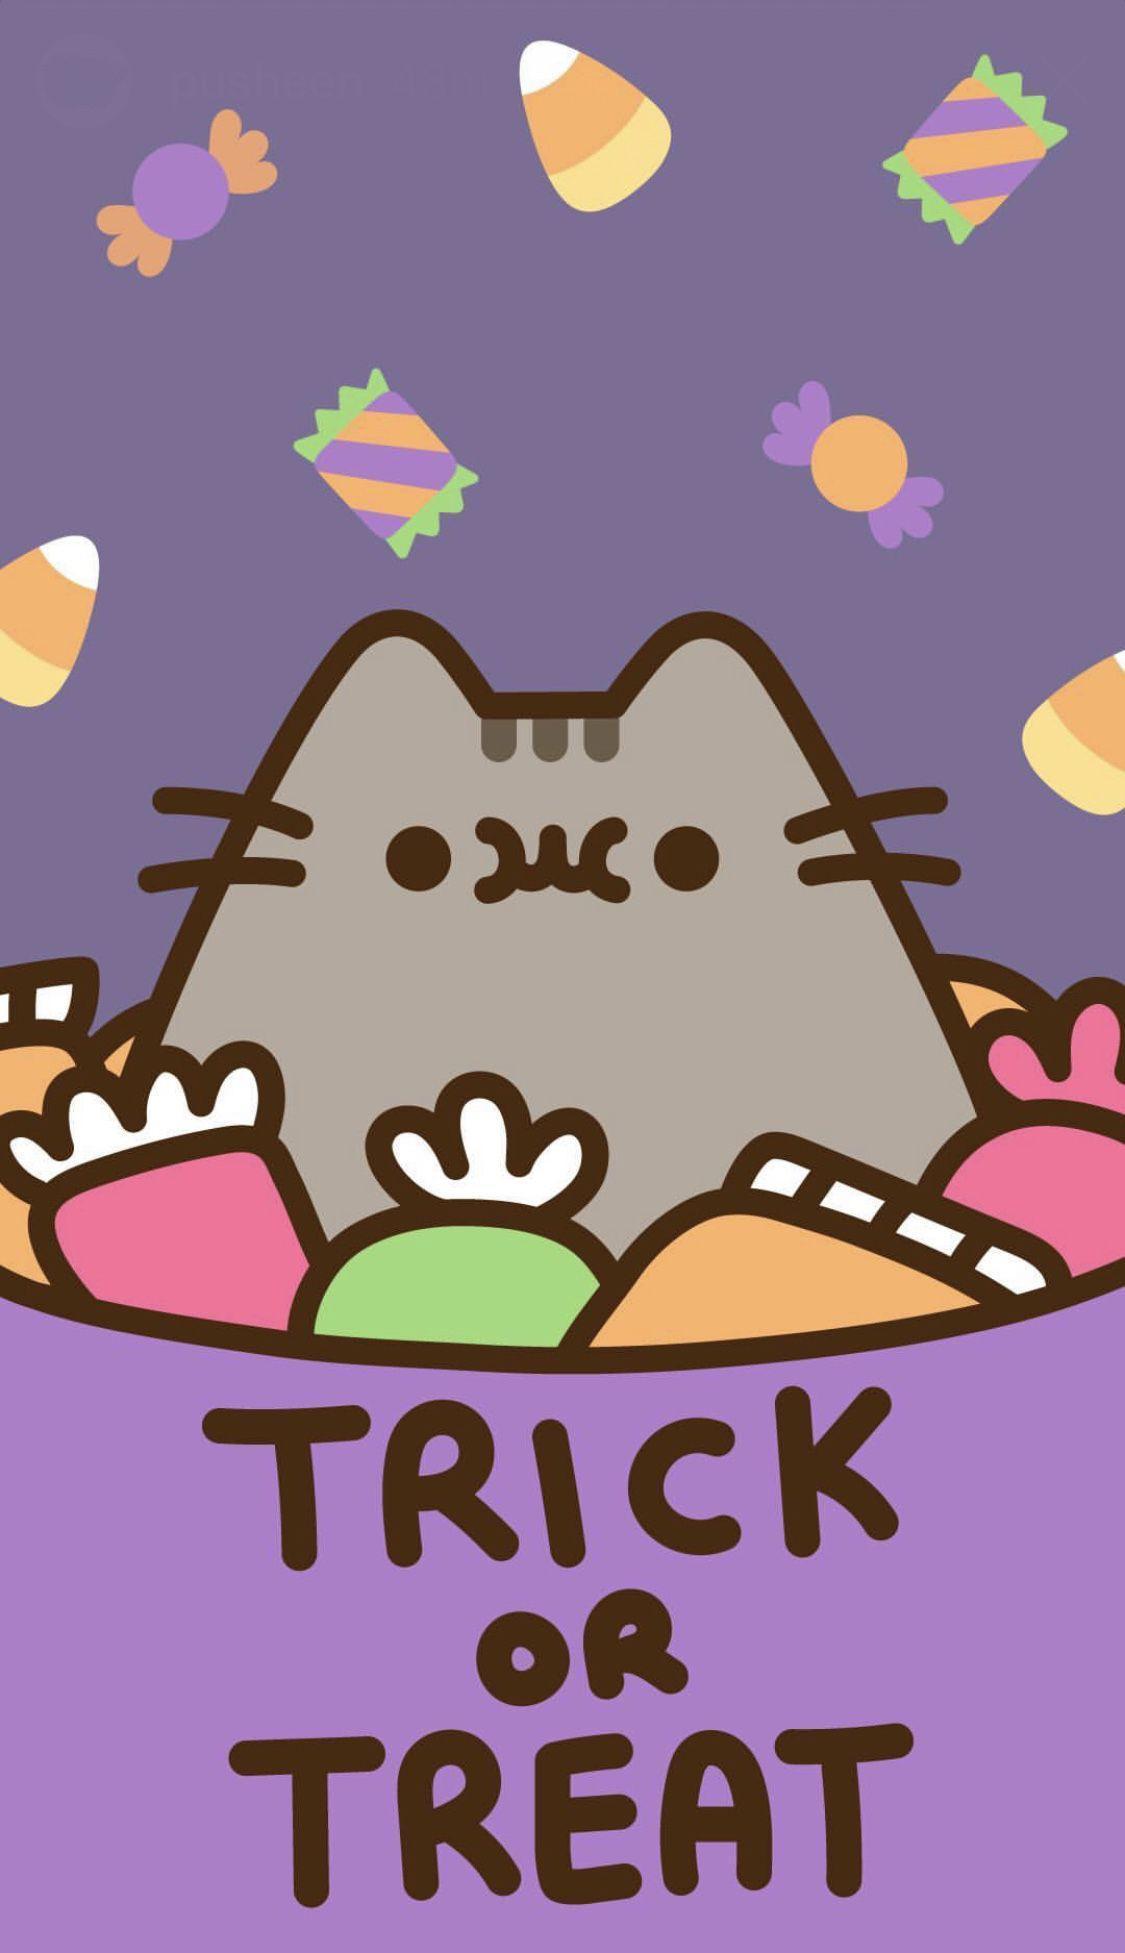 Kawaii Halloween Iphone Wallpapers Top Free Kawaii Halloween Iphone Backgrounds Wallpaperaccess